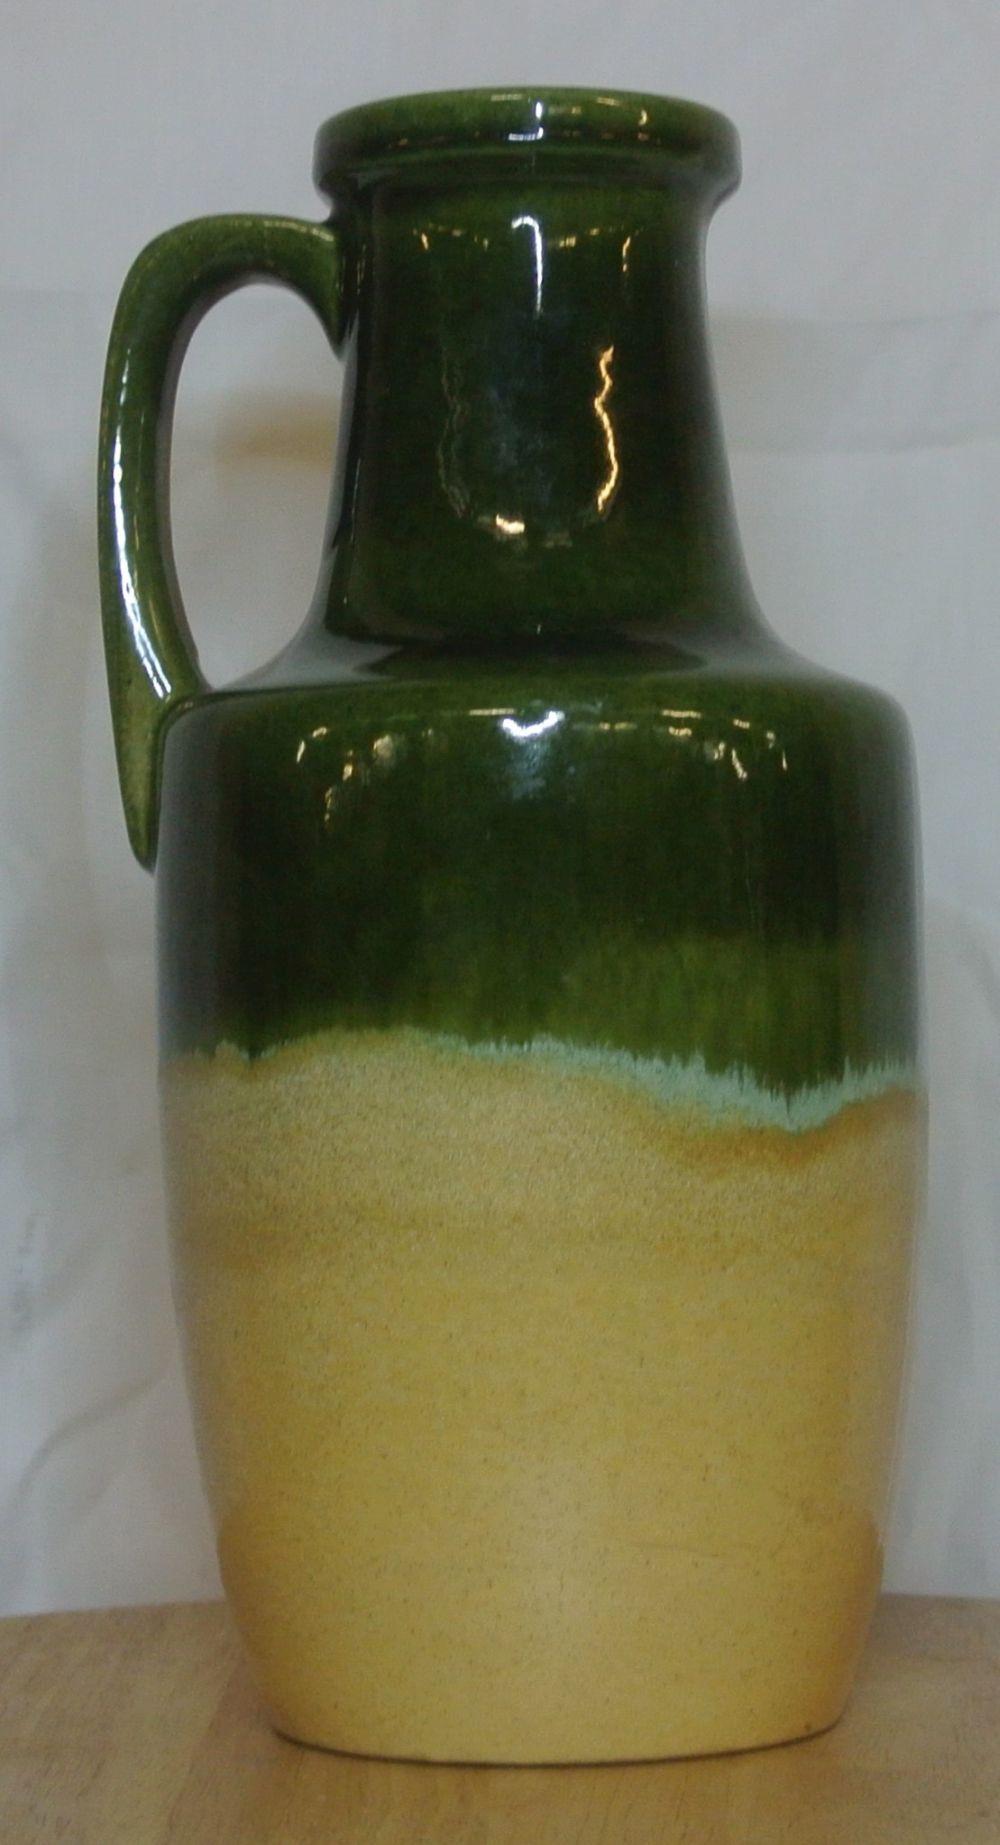 Lot 41: A vintage/ Mid Century Western German 'Fat Lava' jug